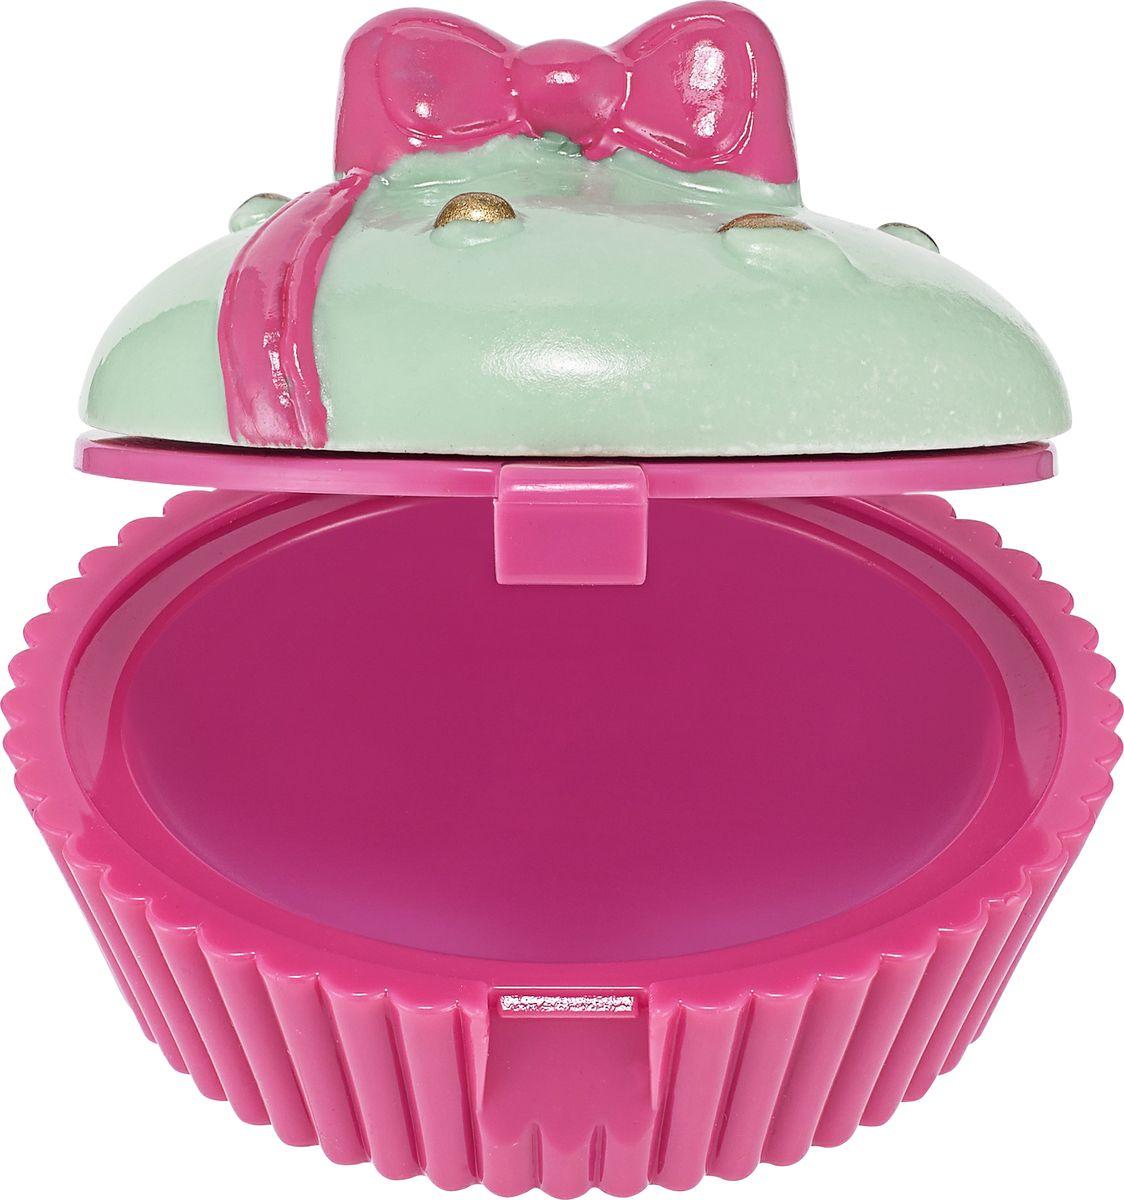 Holika Holika Бальзам для губ Дессерт тайм, тон 02, розовое пирожное, 7 гБ330416644 Holika Holika Dessert Time Lip Balm AD02 (Pink Cup Cake) Бальзам для губ Время десерта (Розовое пирожное).